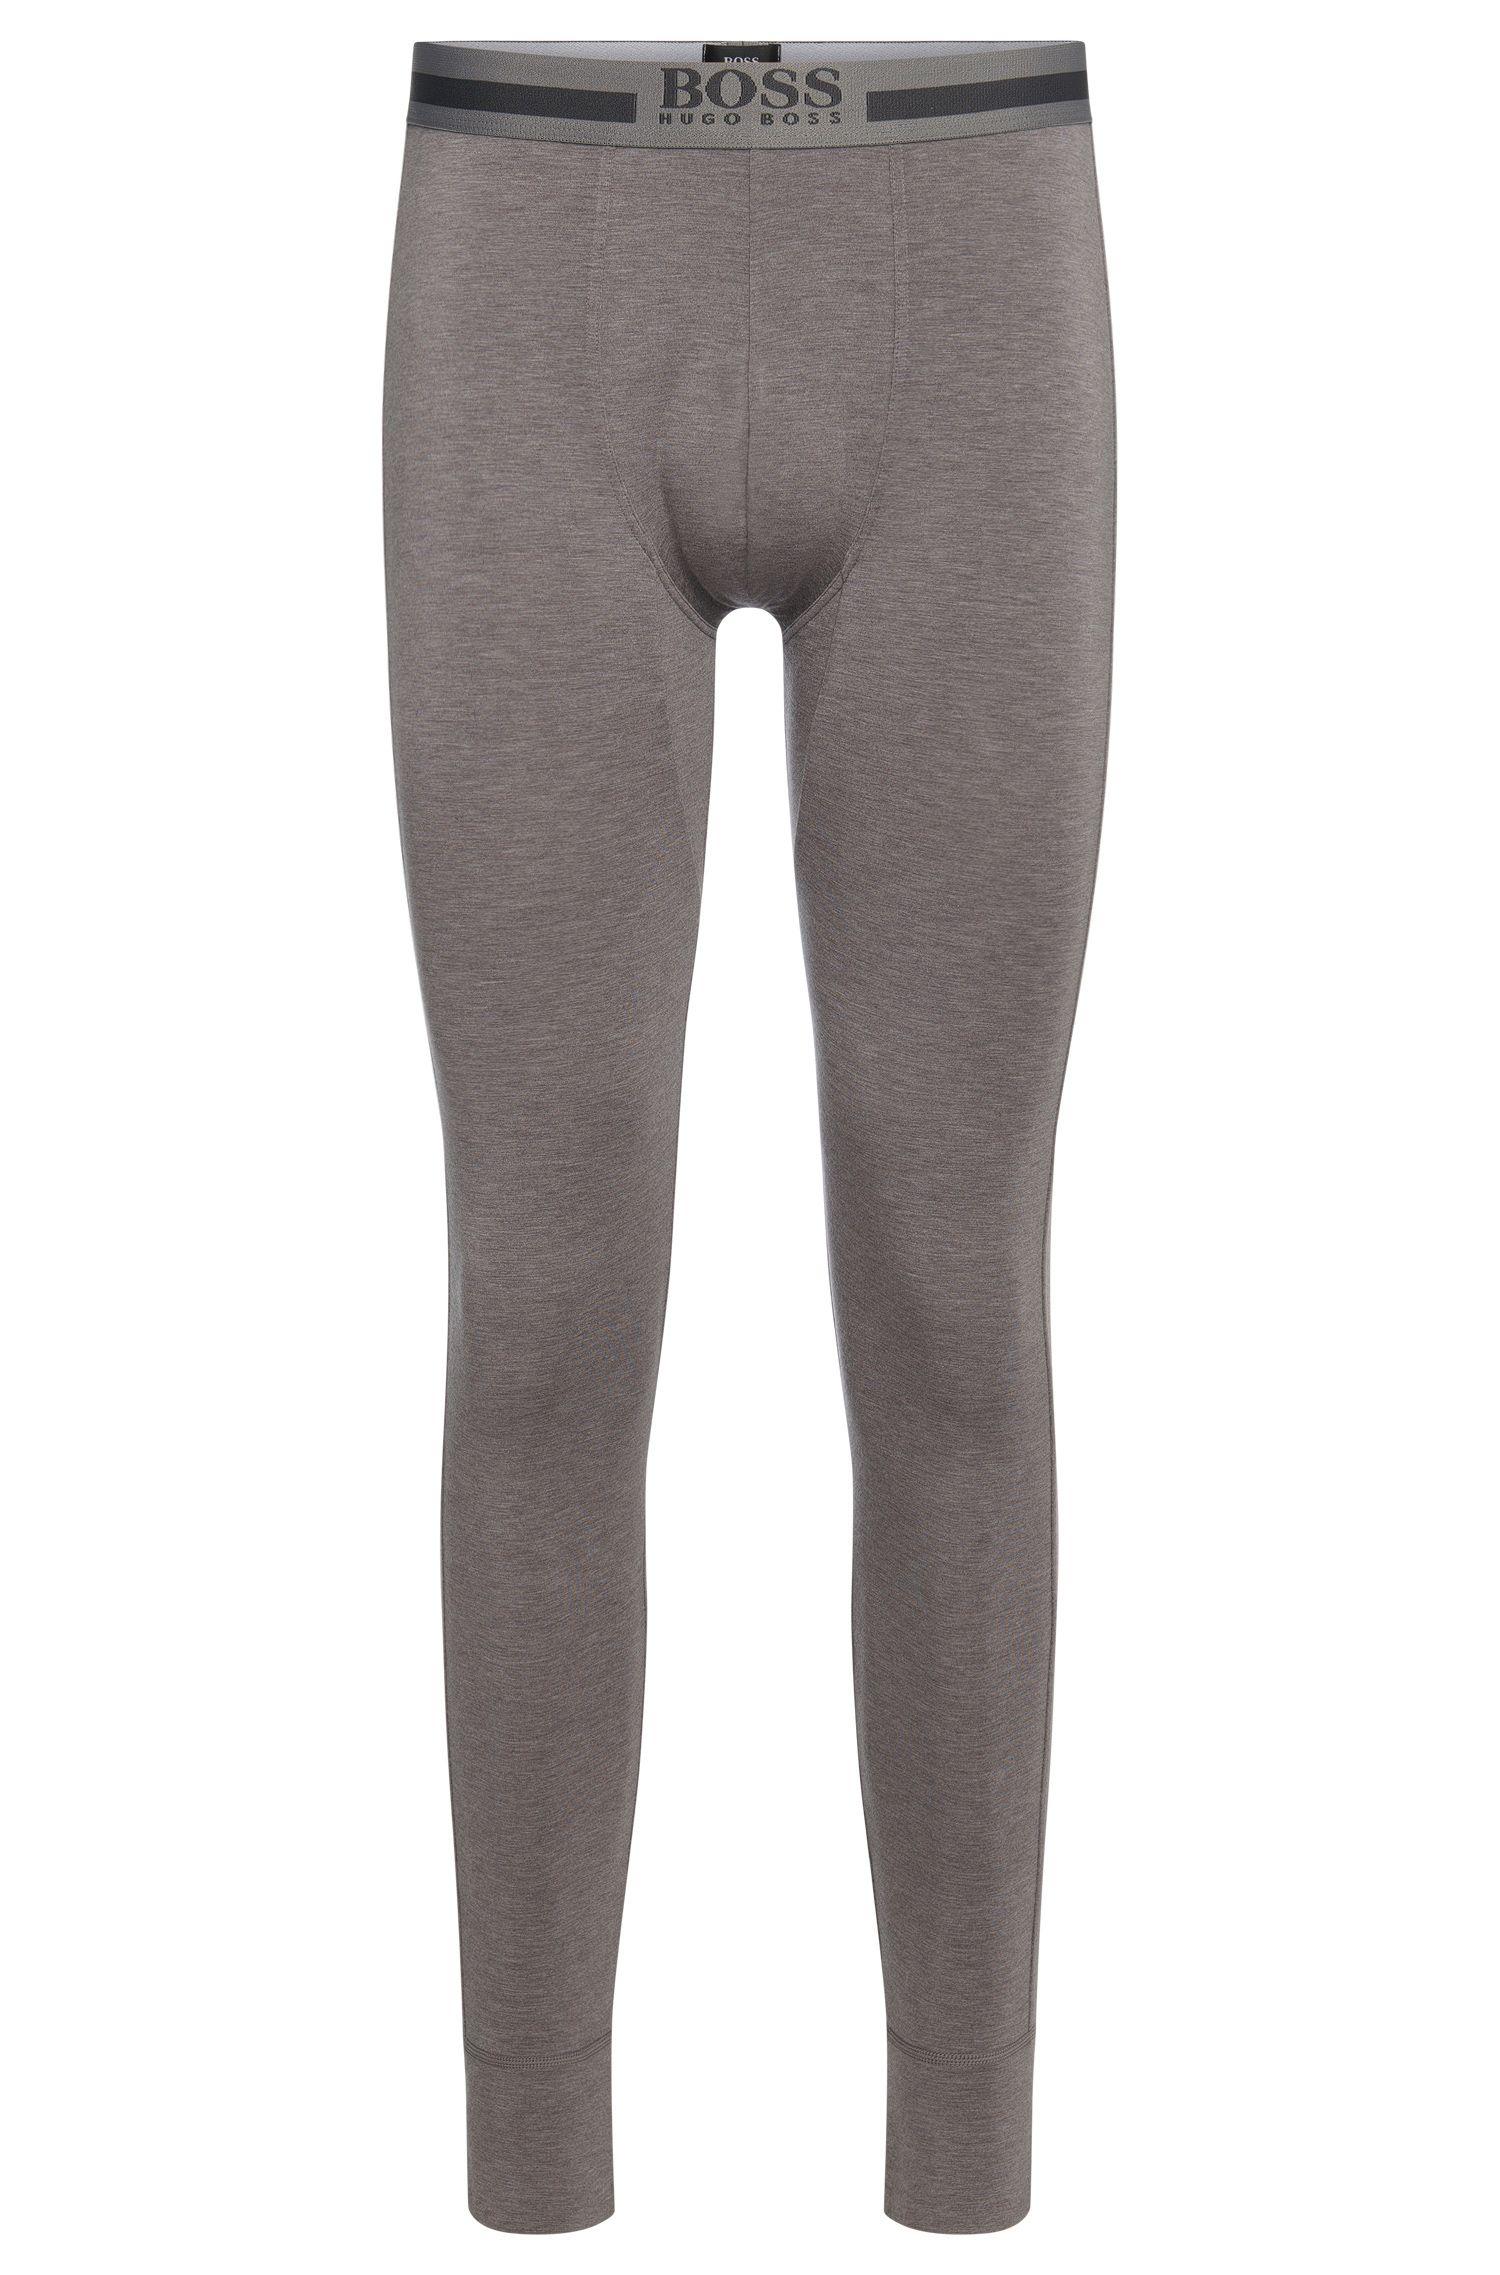 Stretch Viscose Thermal Legging | Long John Thermal, Dark Grey